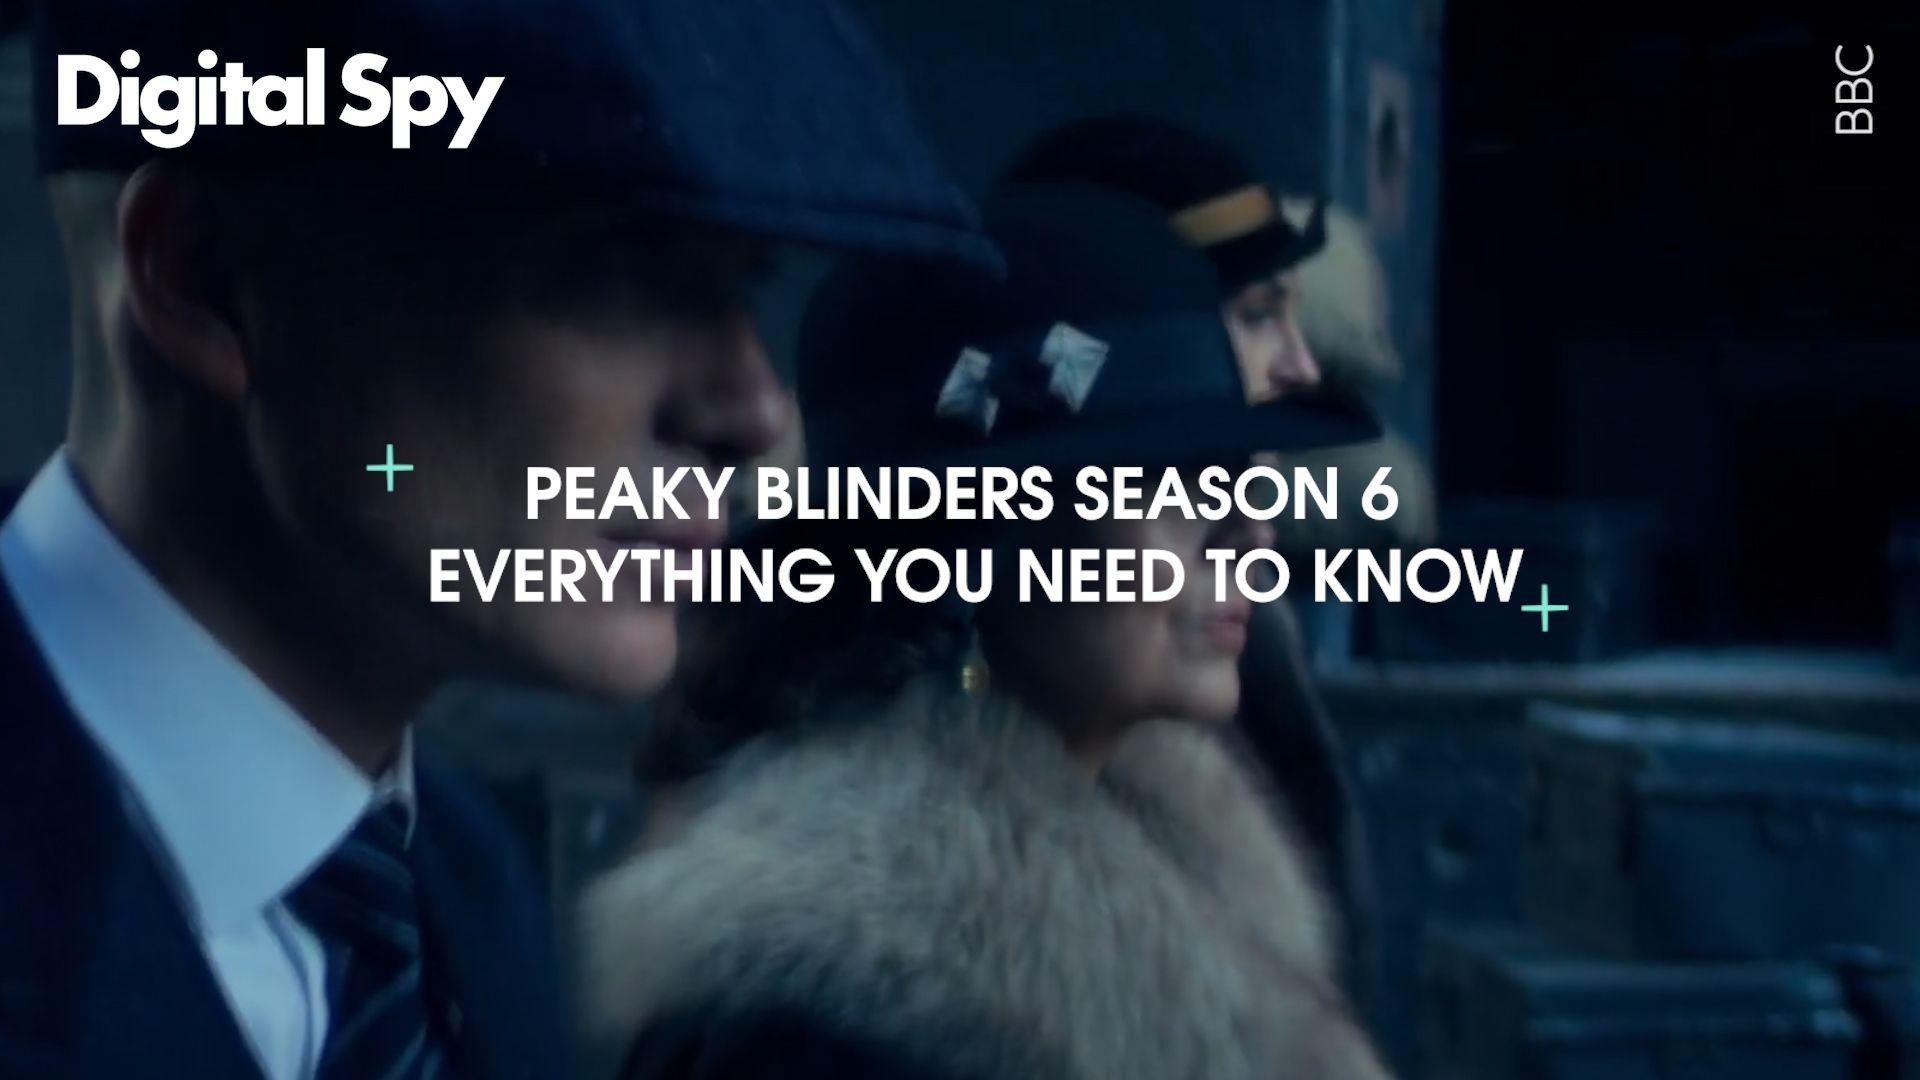 'Peaky Blinders' Season 6 Just Got A Bit Closer